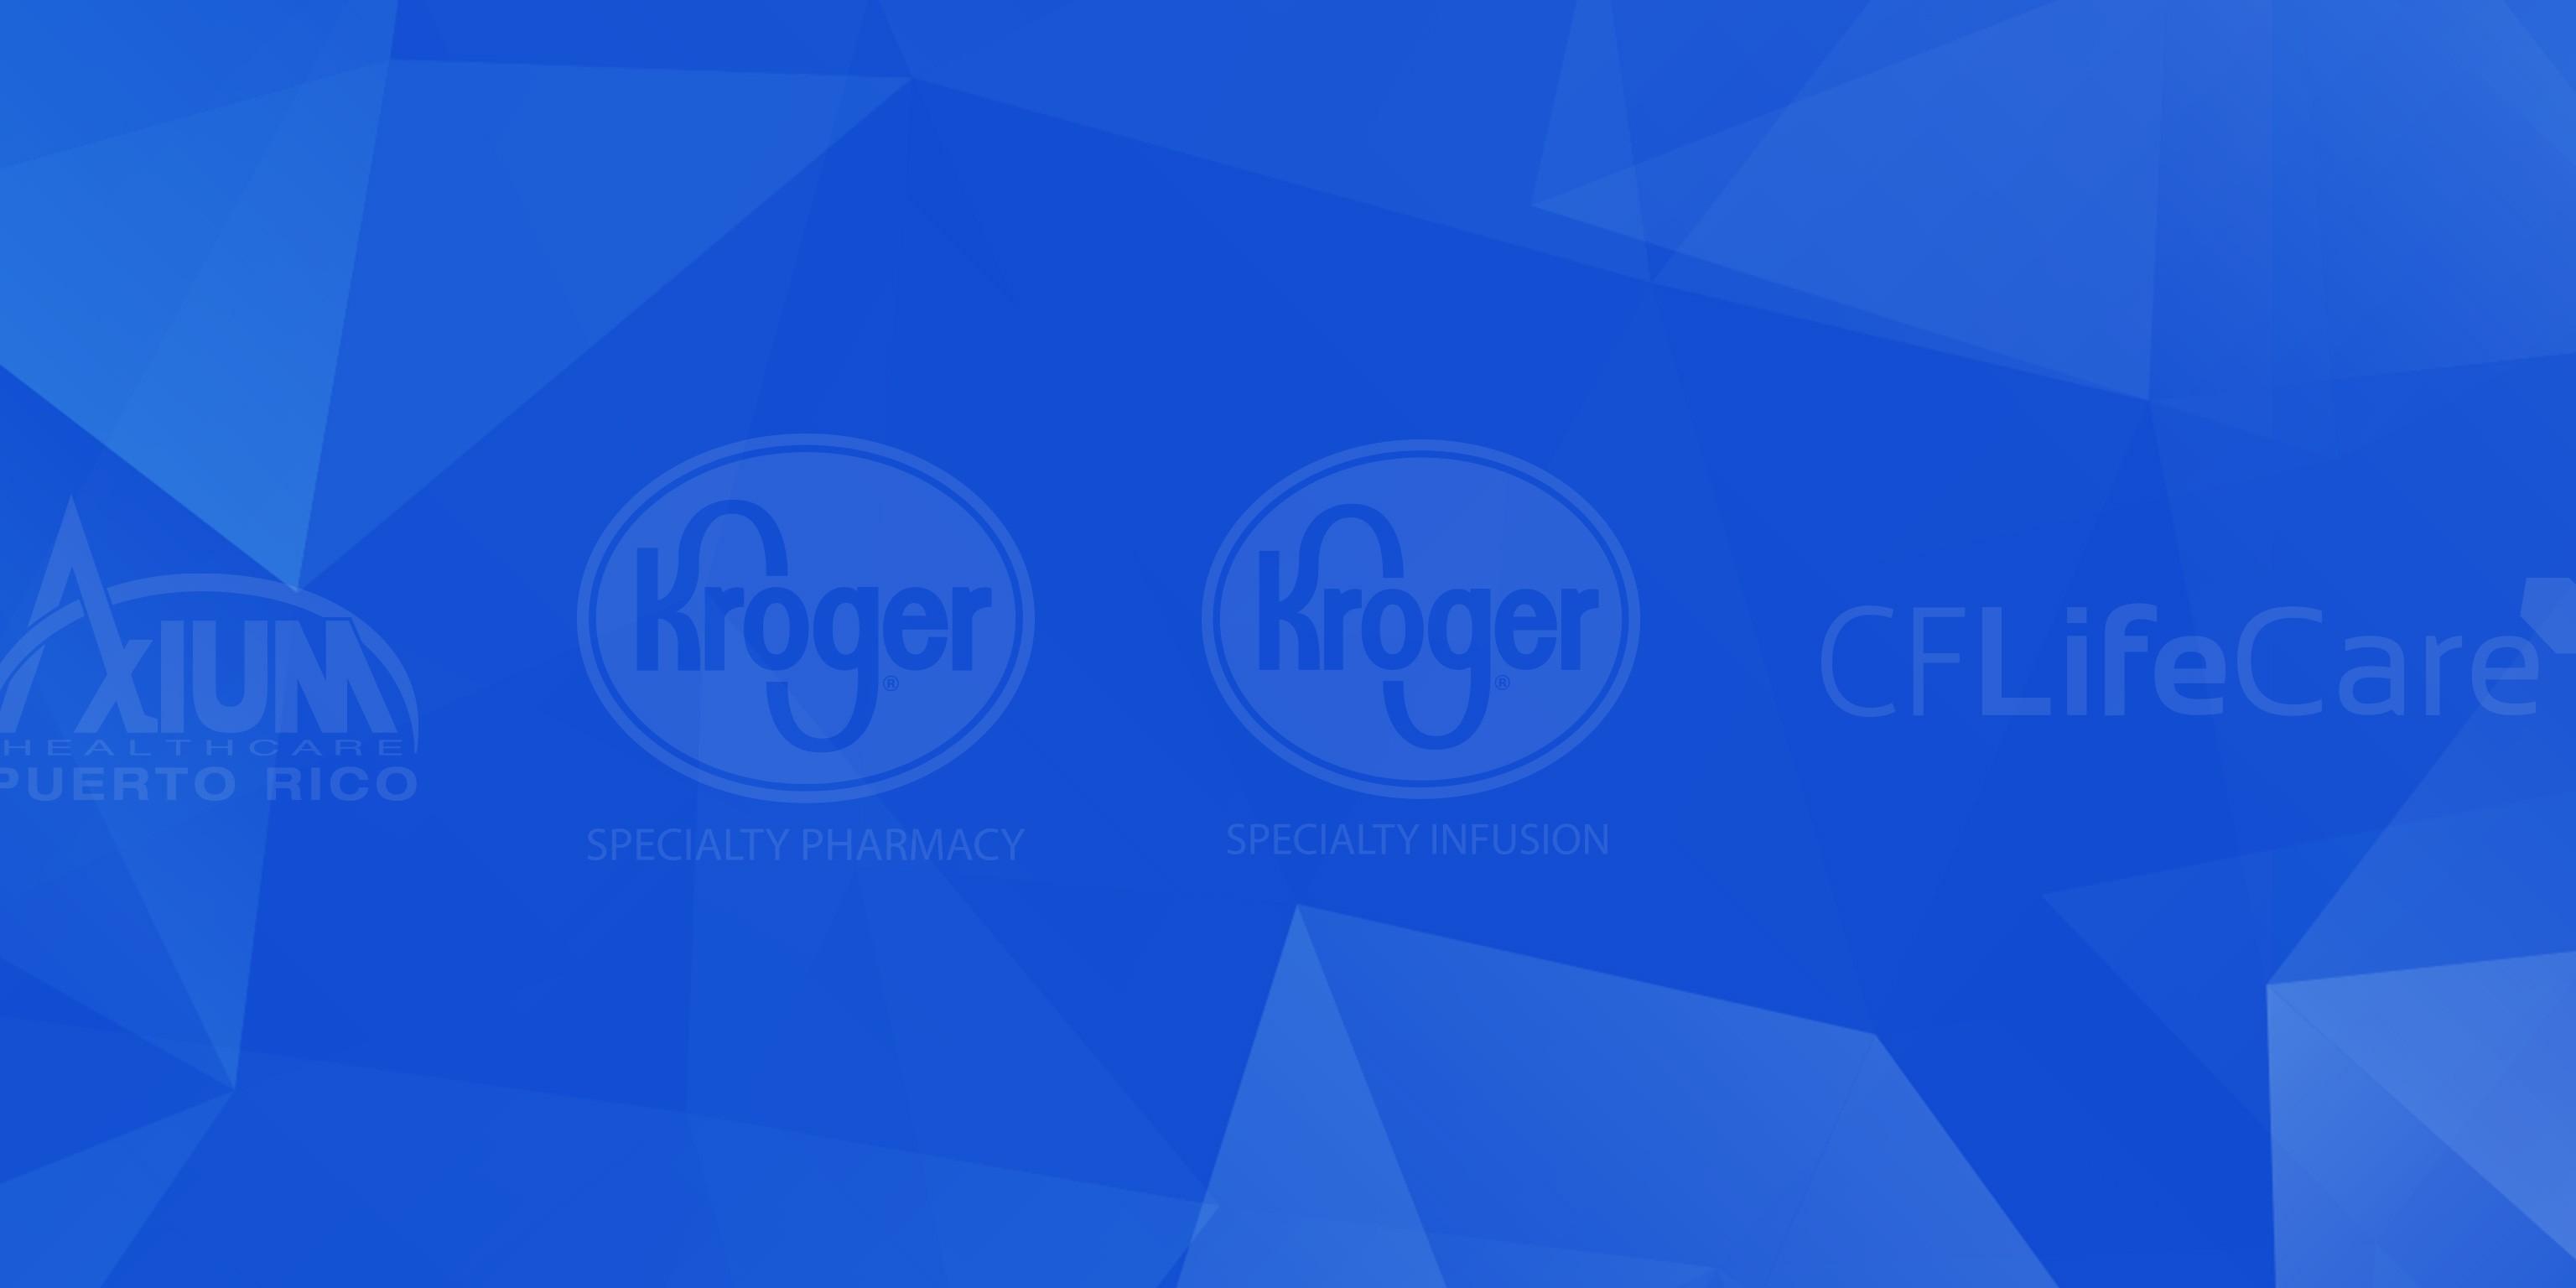 Kroger Specialty Pharmacy | LinkedIn